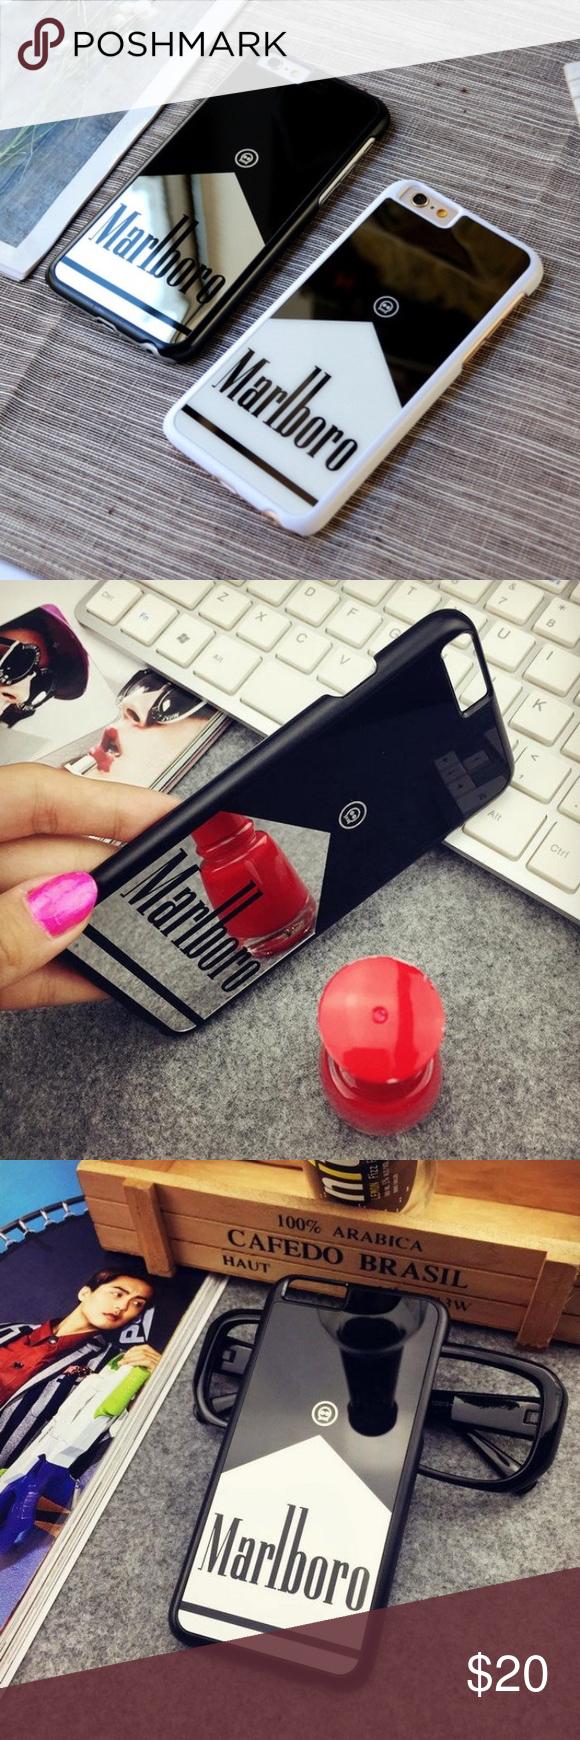 Black Marlboro iPhone 6/6s/6 Plus case Brand new still in